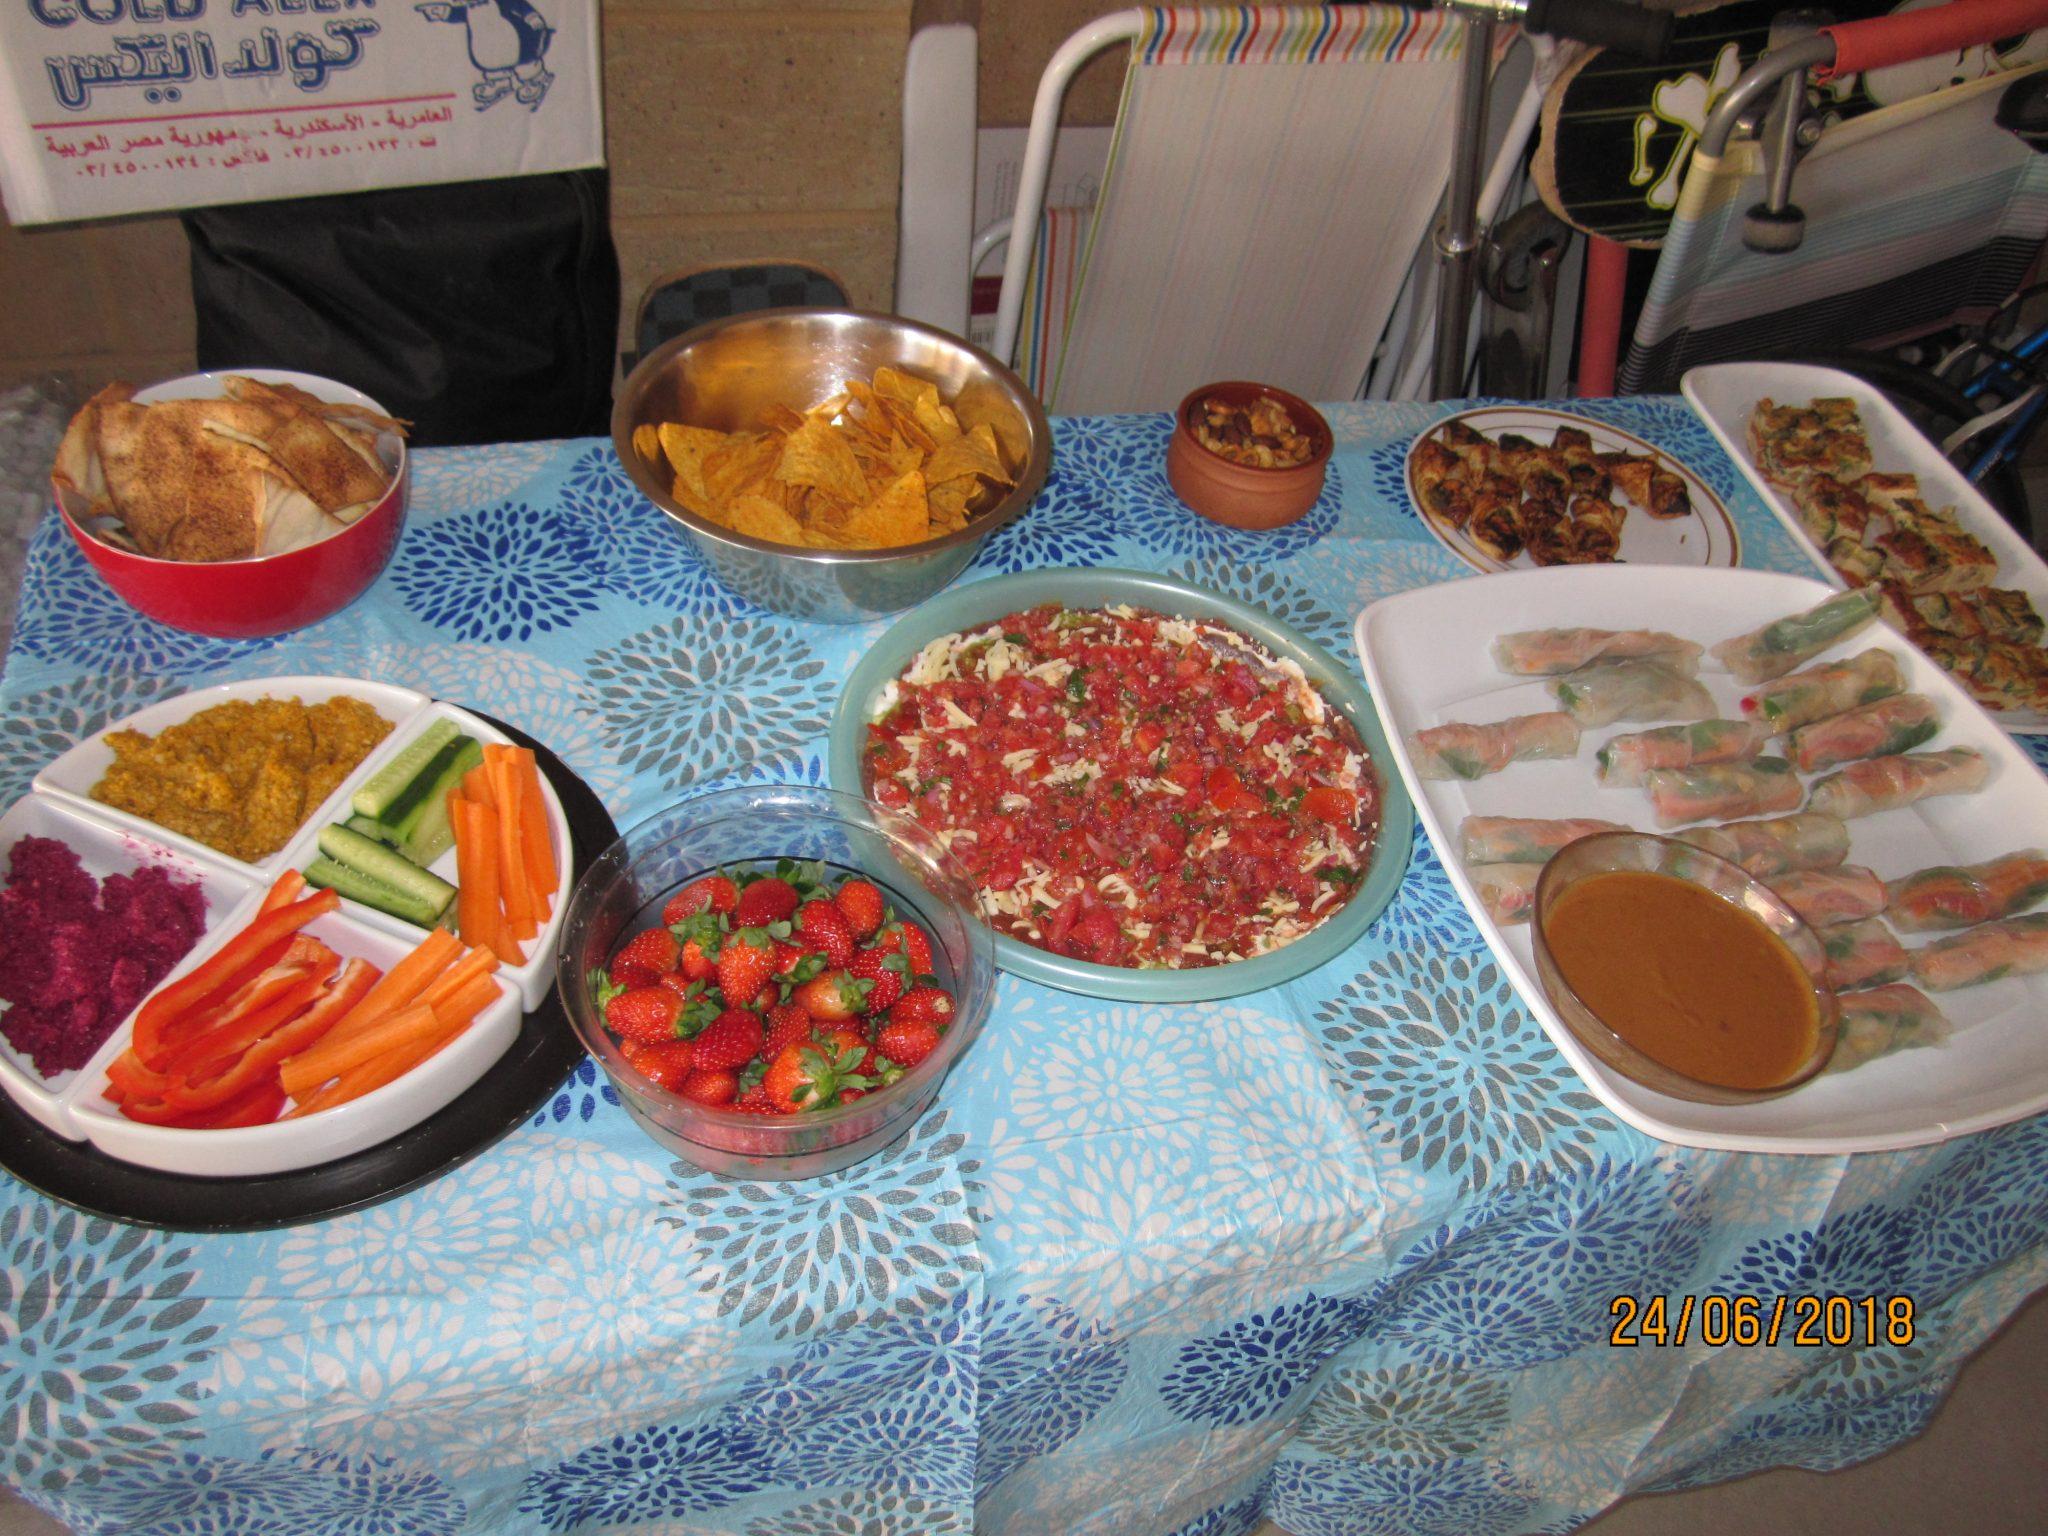 Vietnamese, rice paper rolls, Mexican 7-layered dip, home-made cashew pumpkin dip, home-made beetroot dip.